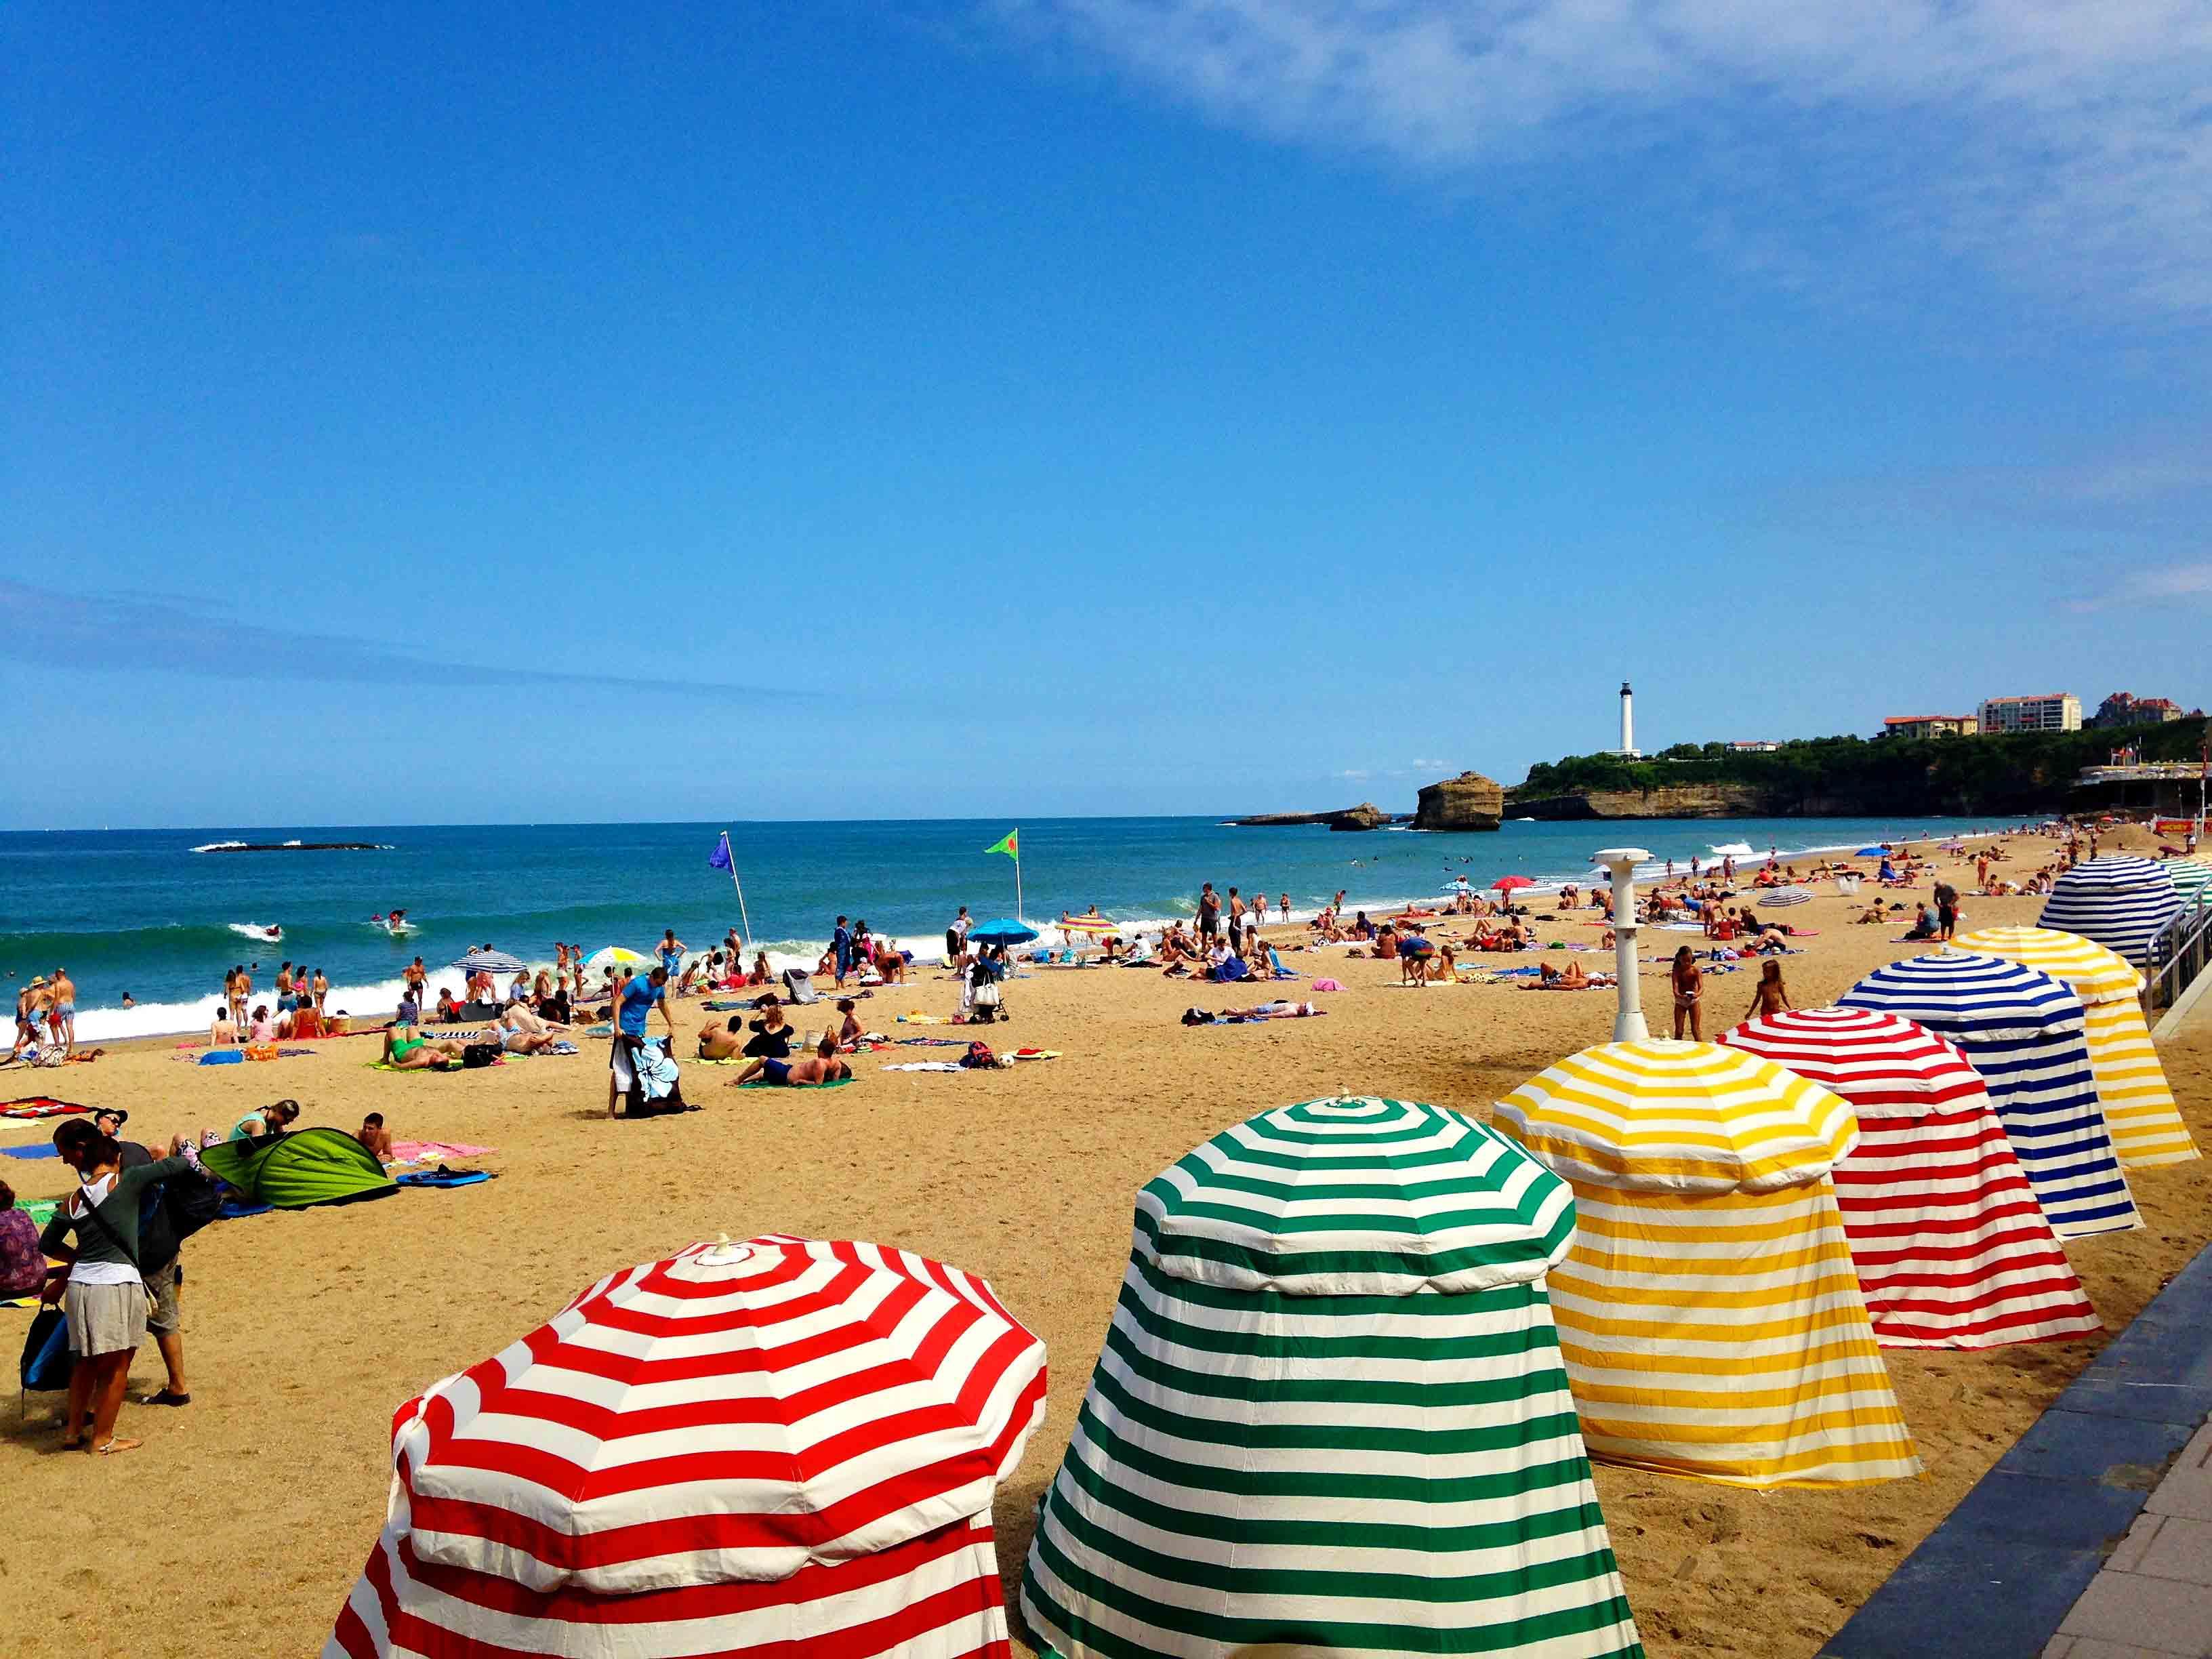 biarritz plage beach view france